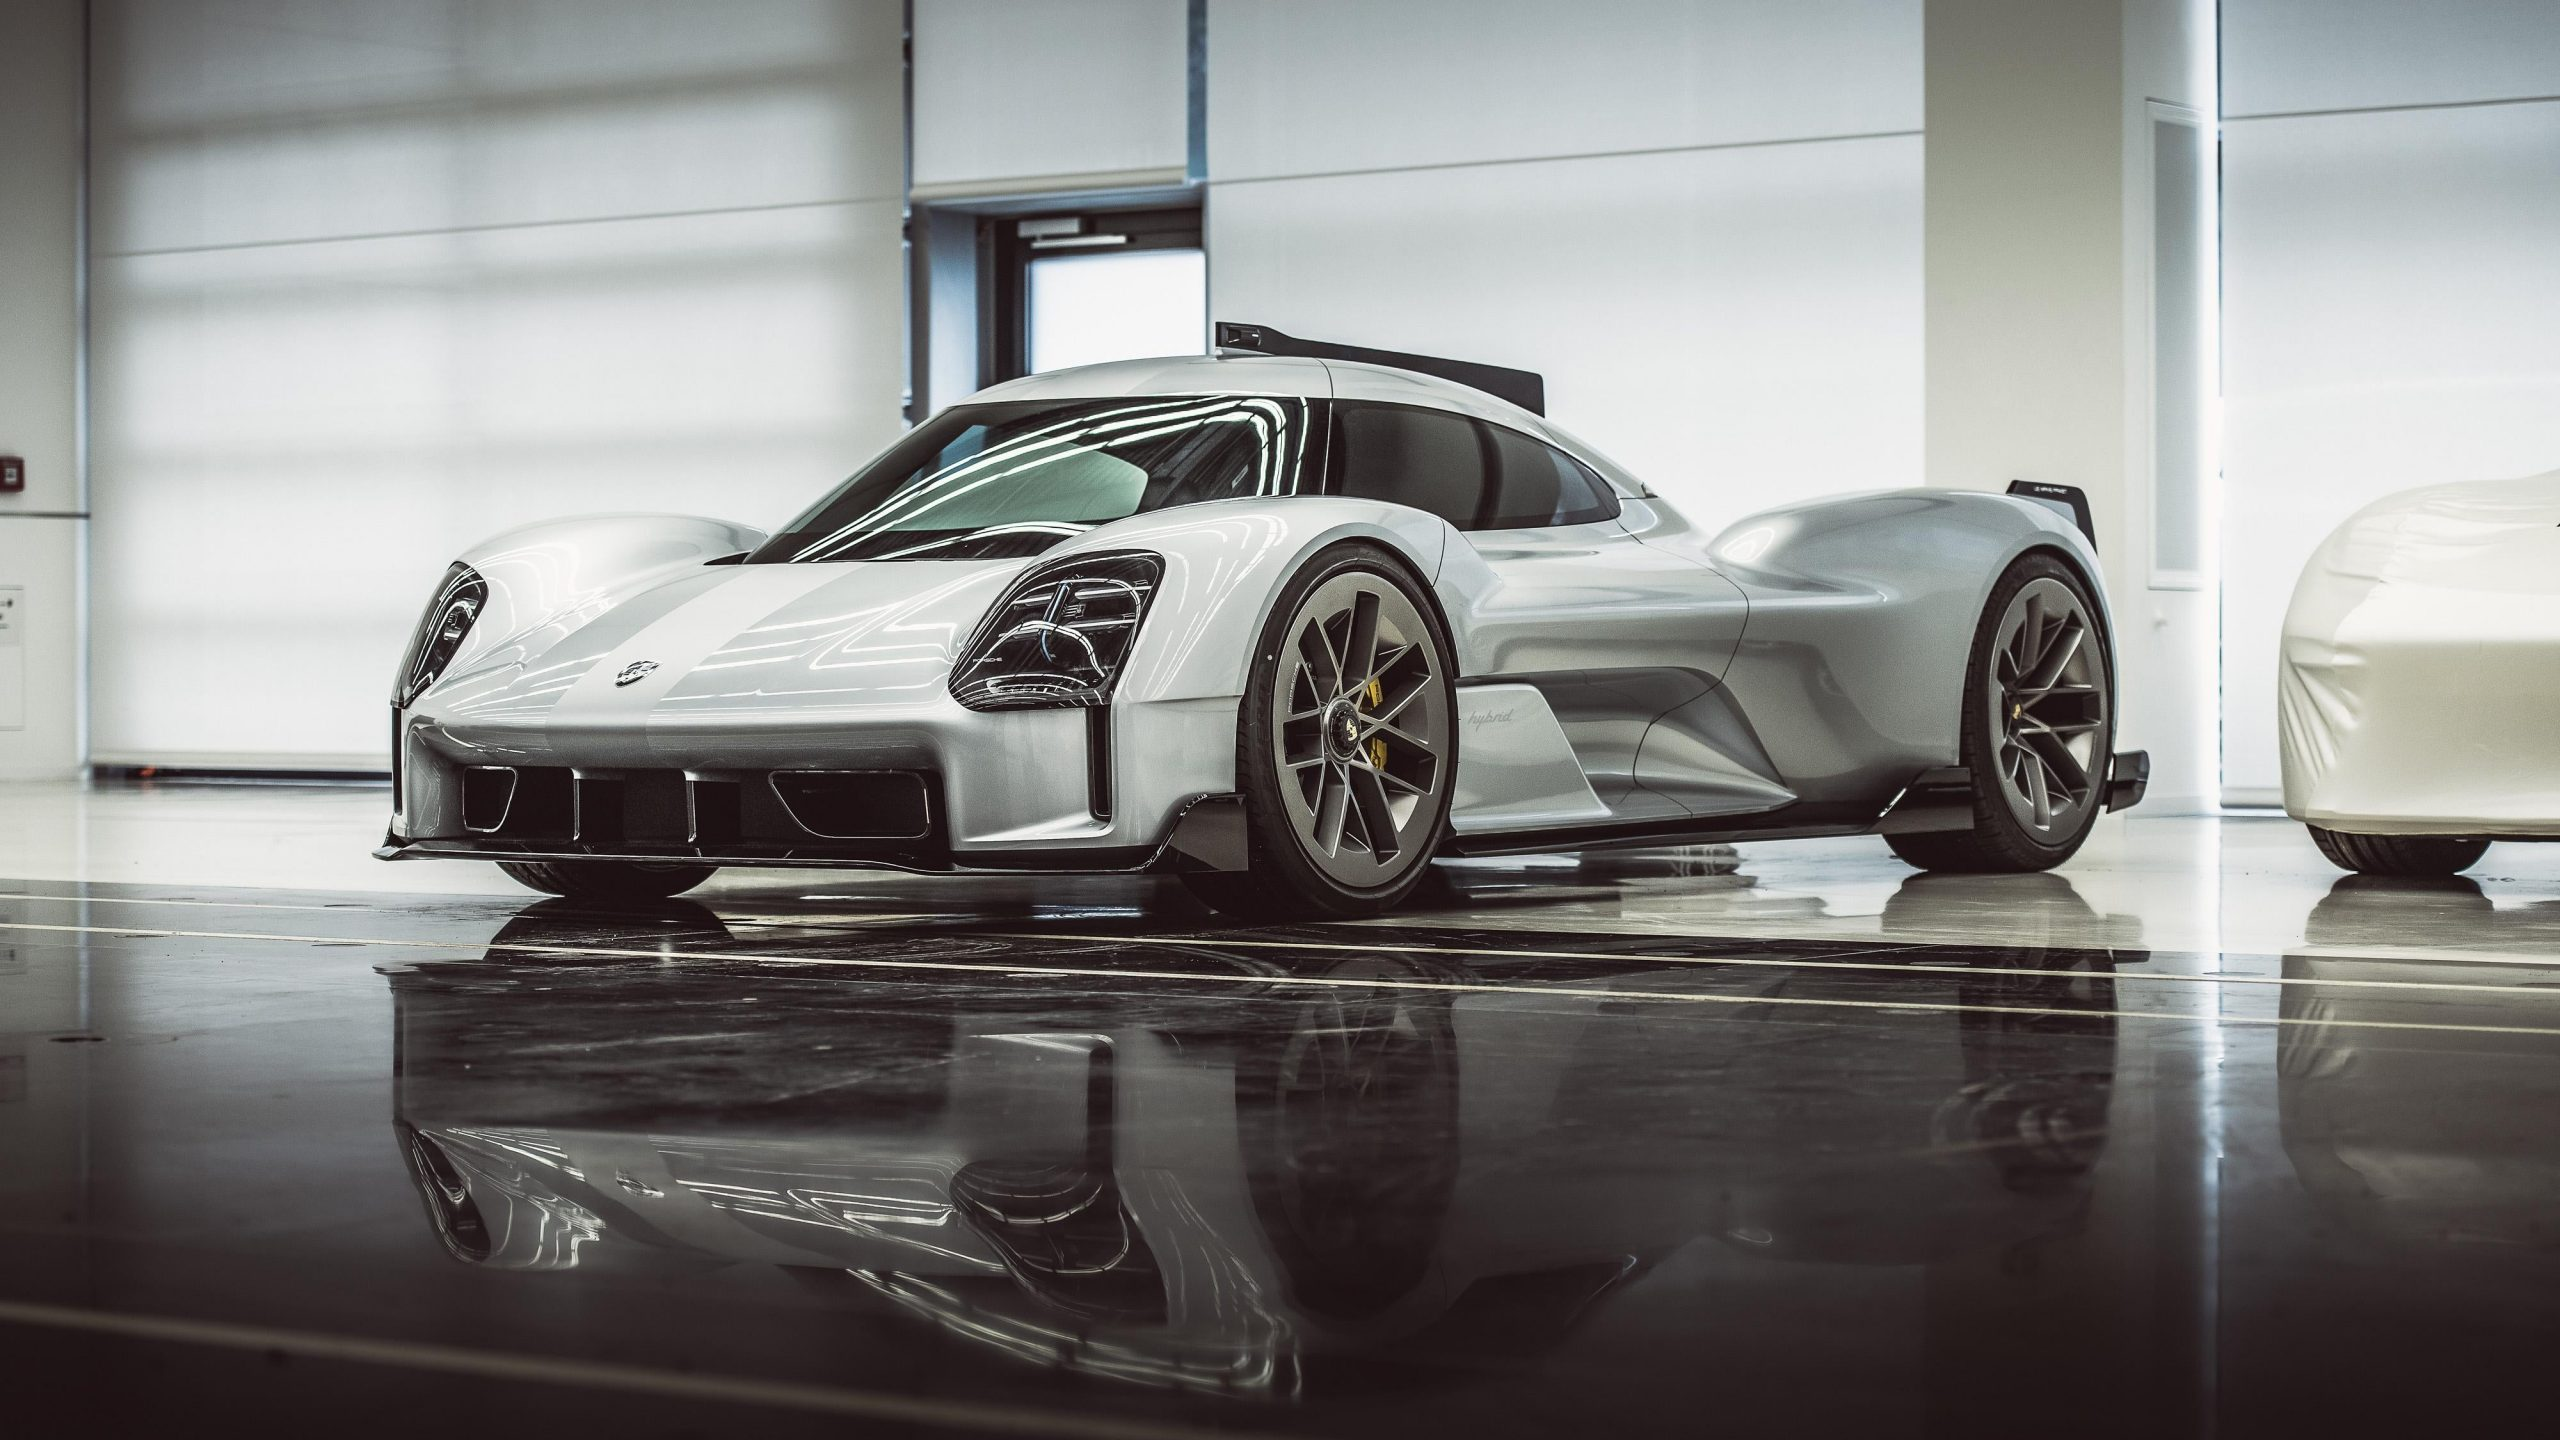 2017 Porsche 919 Street, pop or flop?